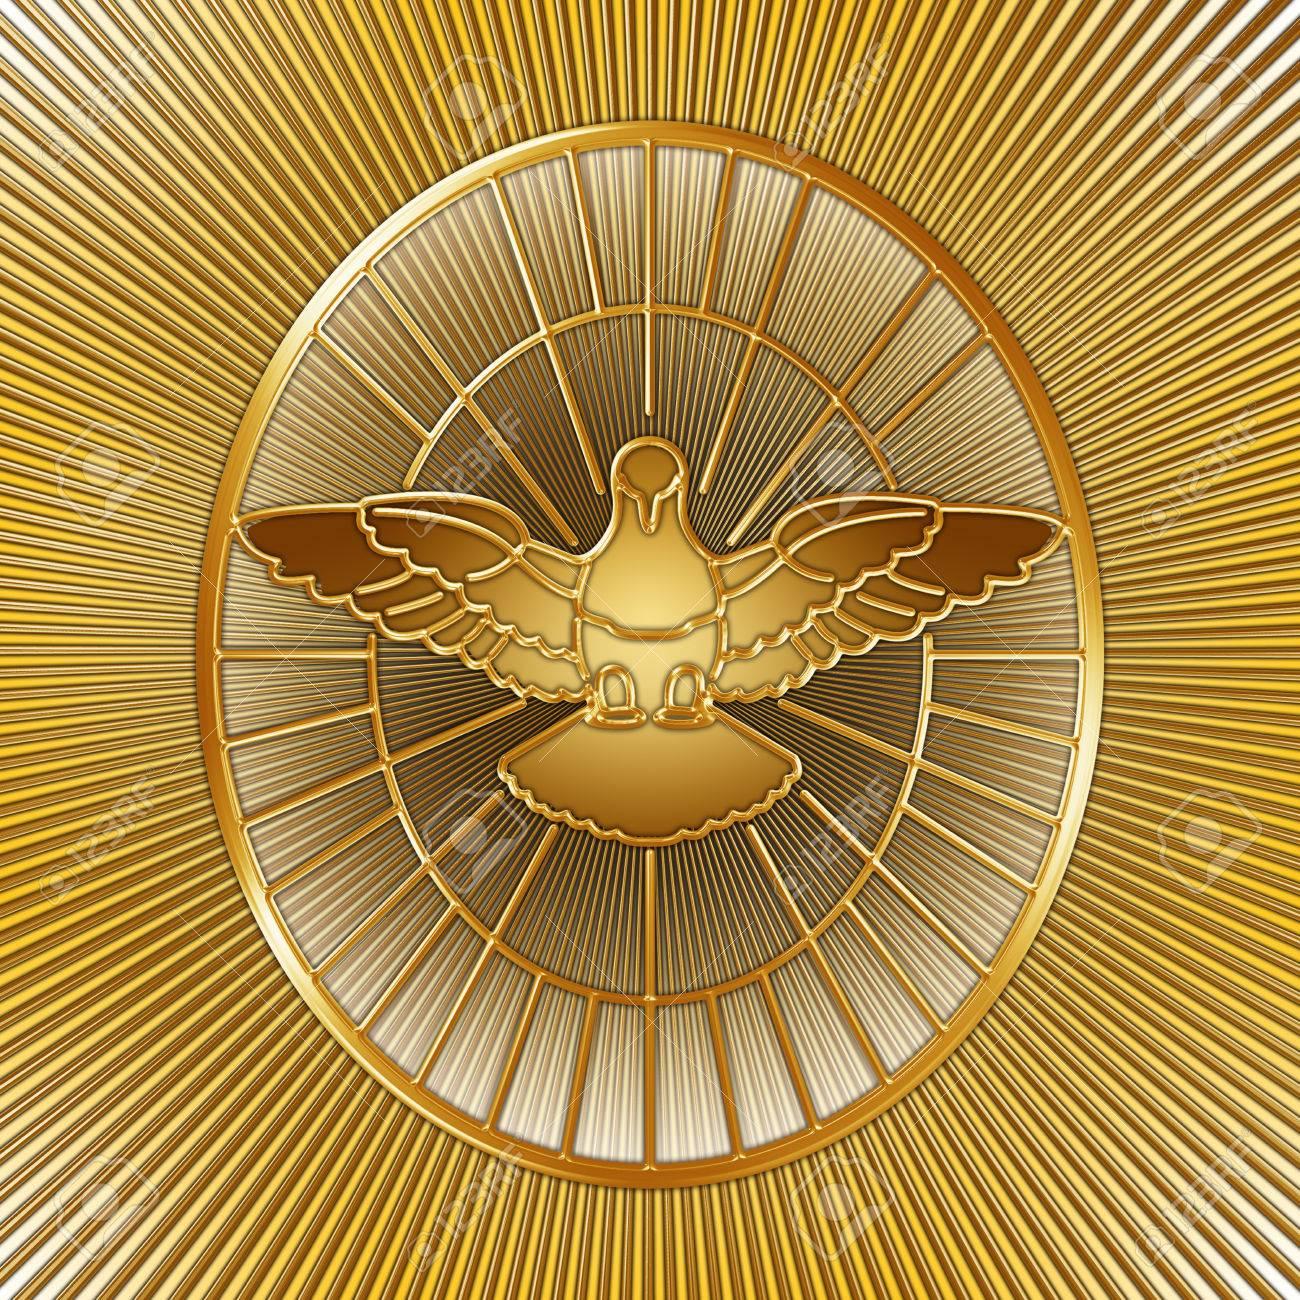 Holy Spirit symbol, Saint Peter, Rome, graphic design, illustration - 83208028